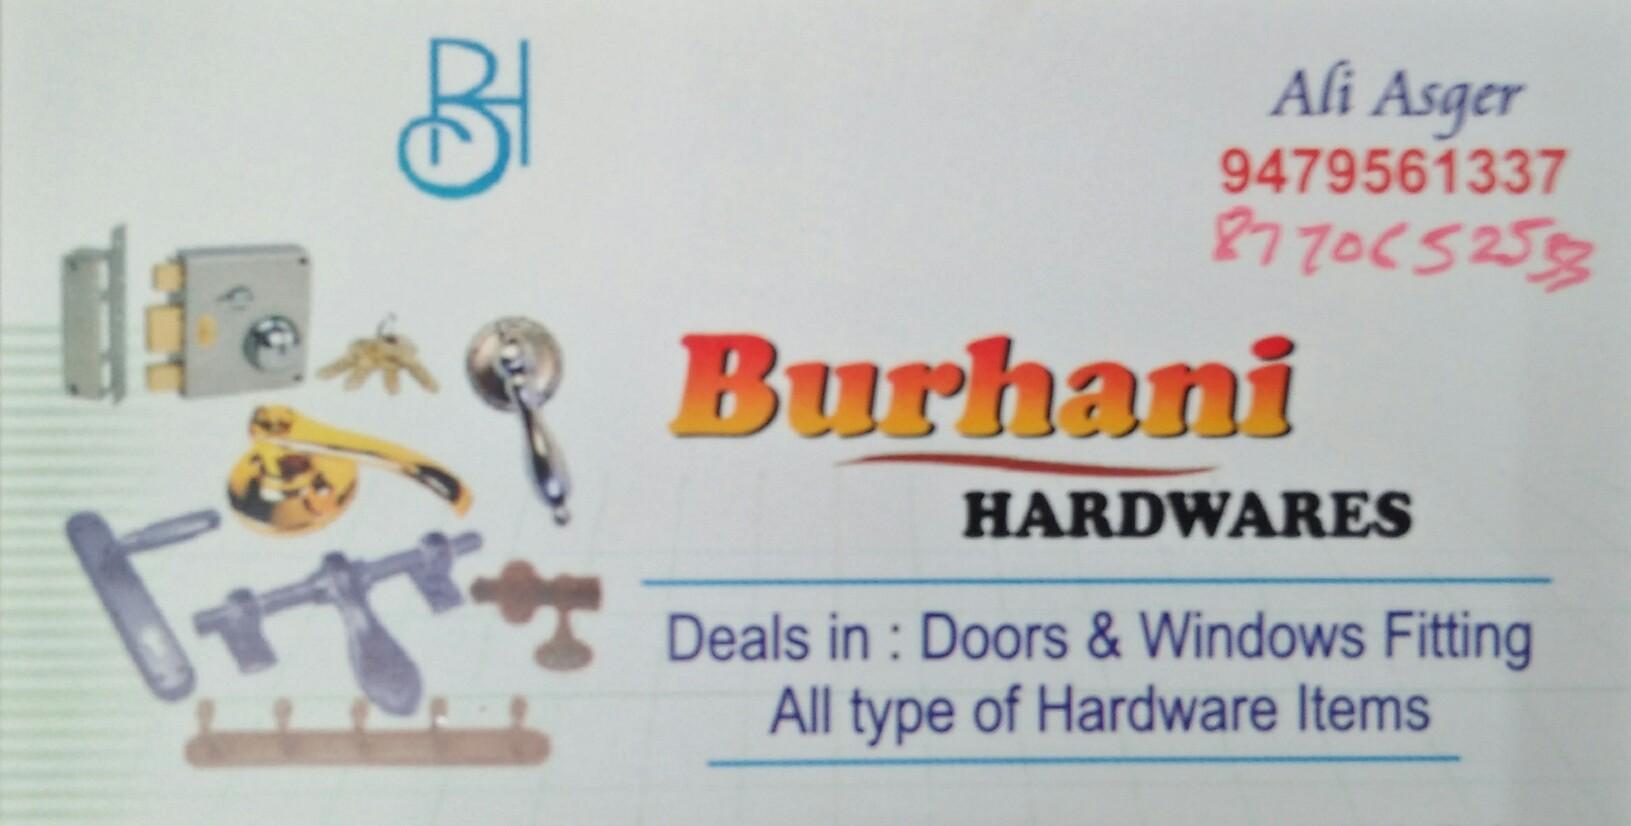 Burhani hardwares